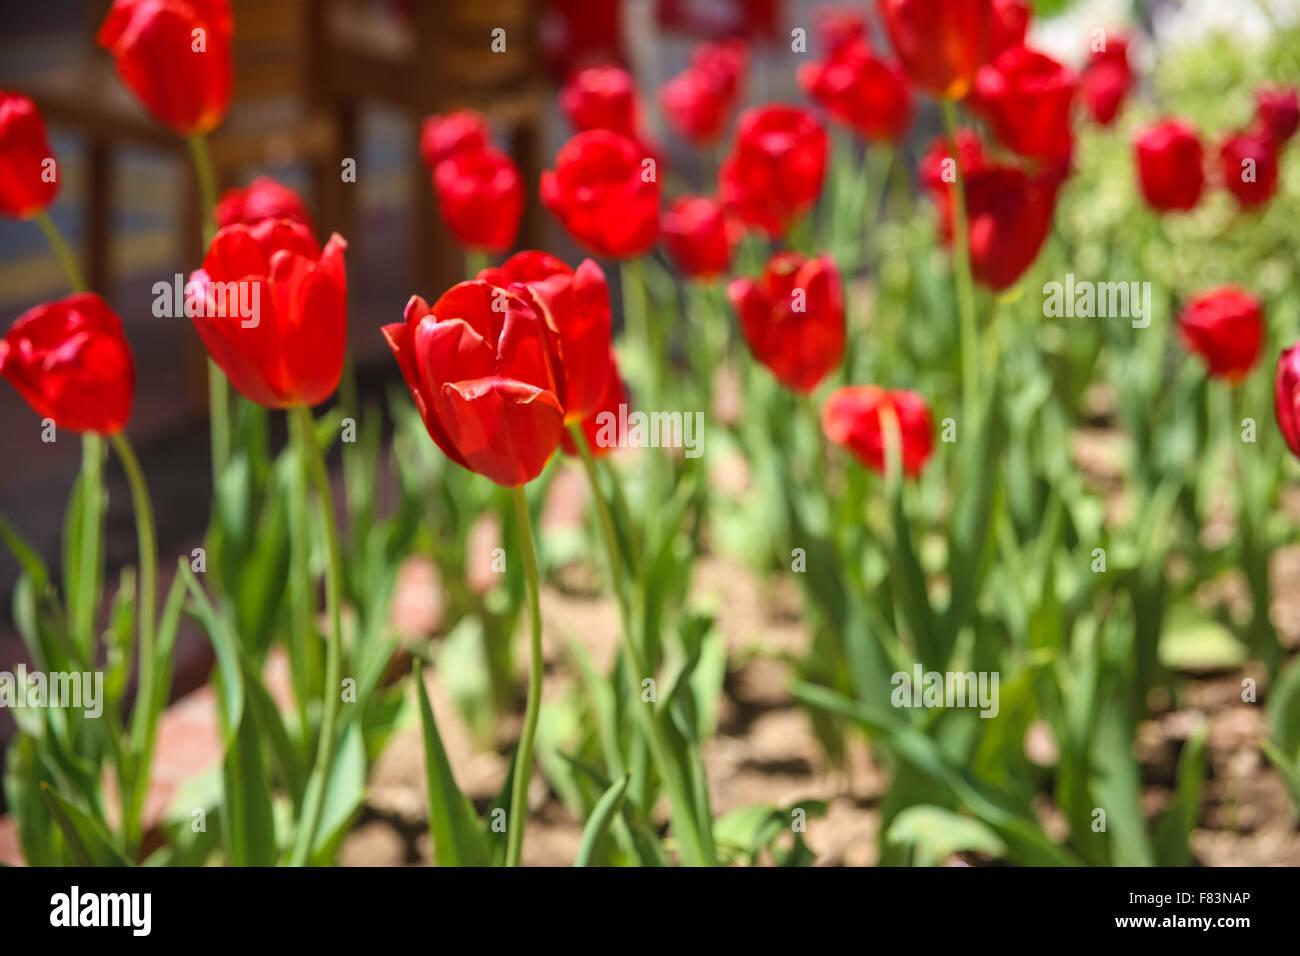 Spring flowers tullips on the big clumb stock photo 91051710 alamy spring flowers tullips on the big clumb mightylinksfo